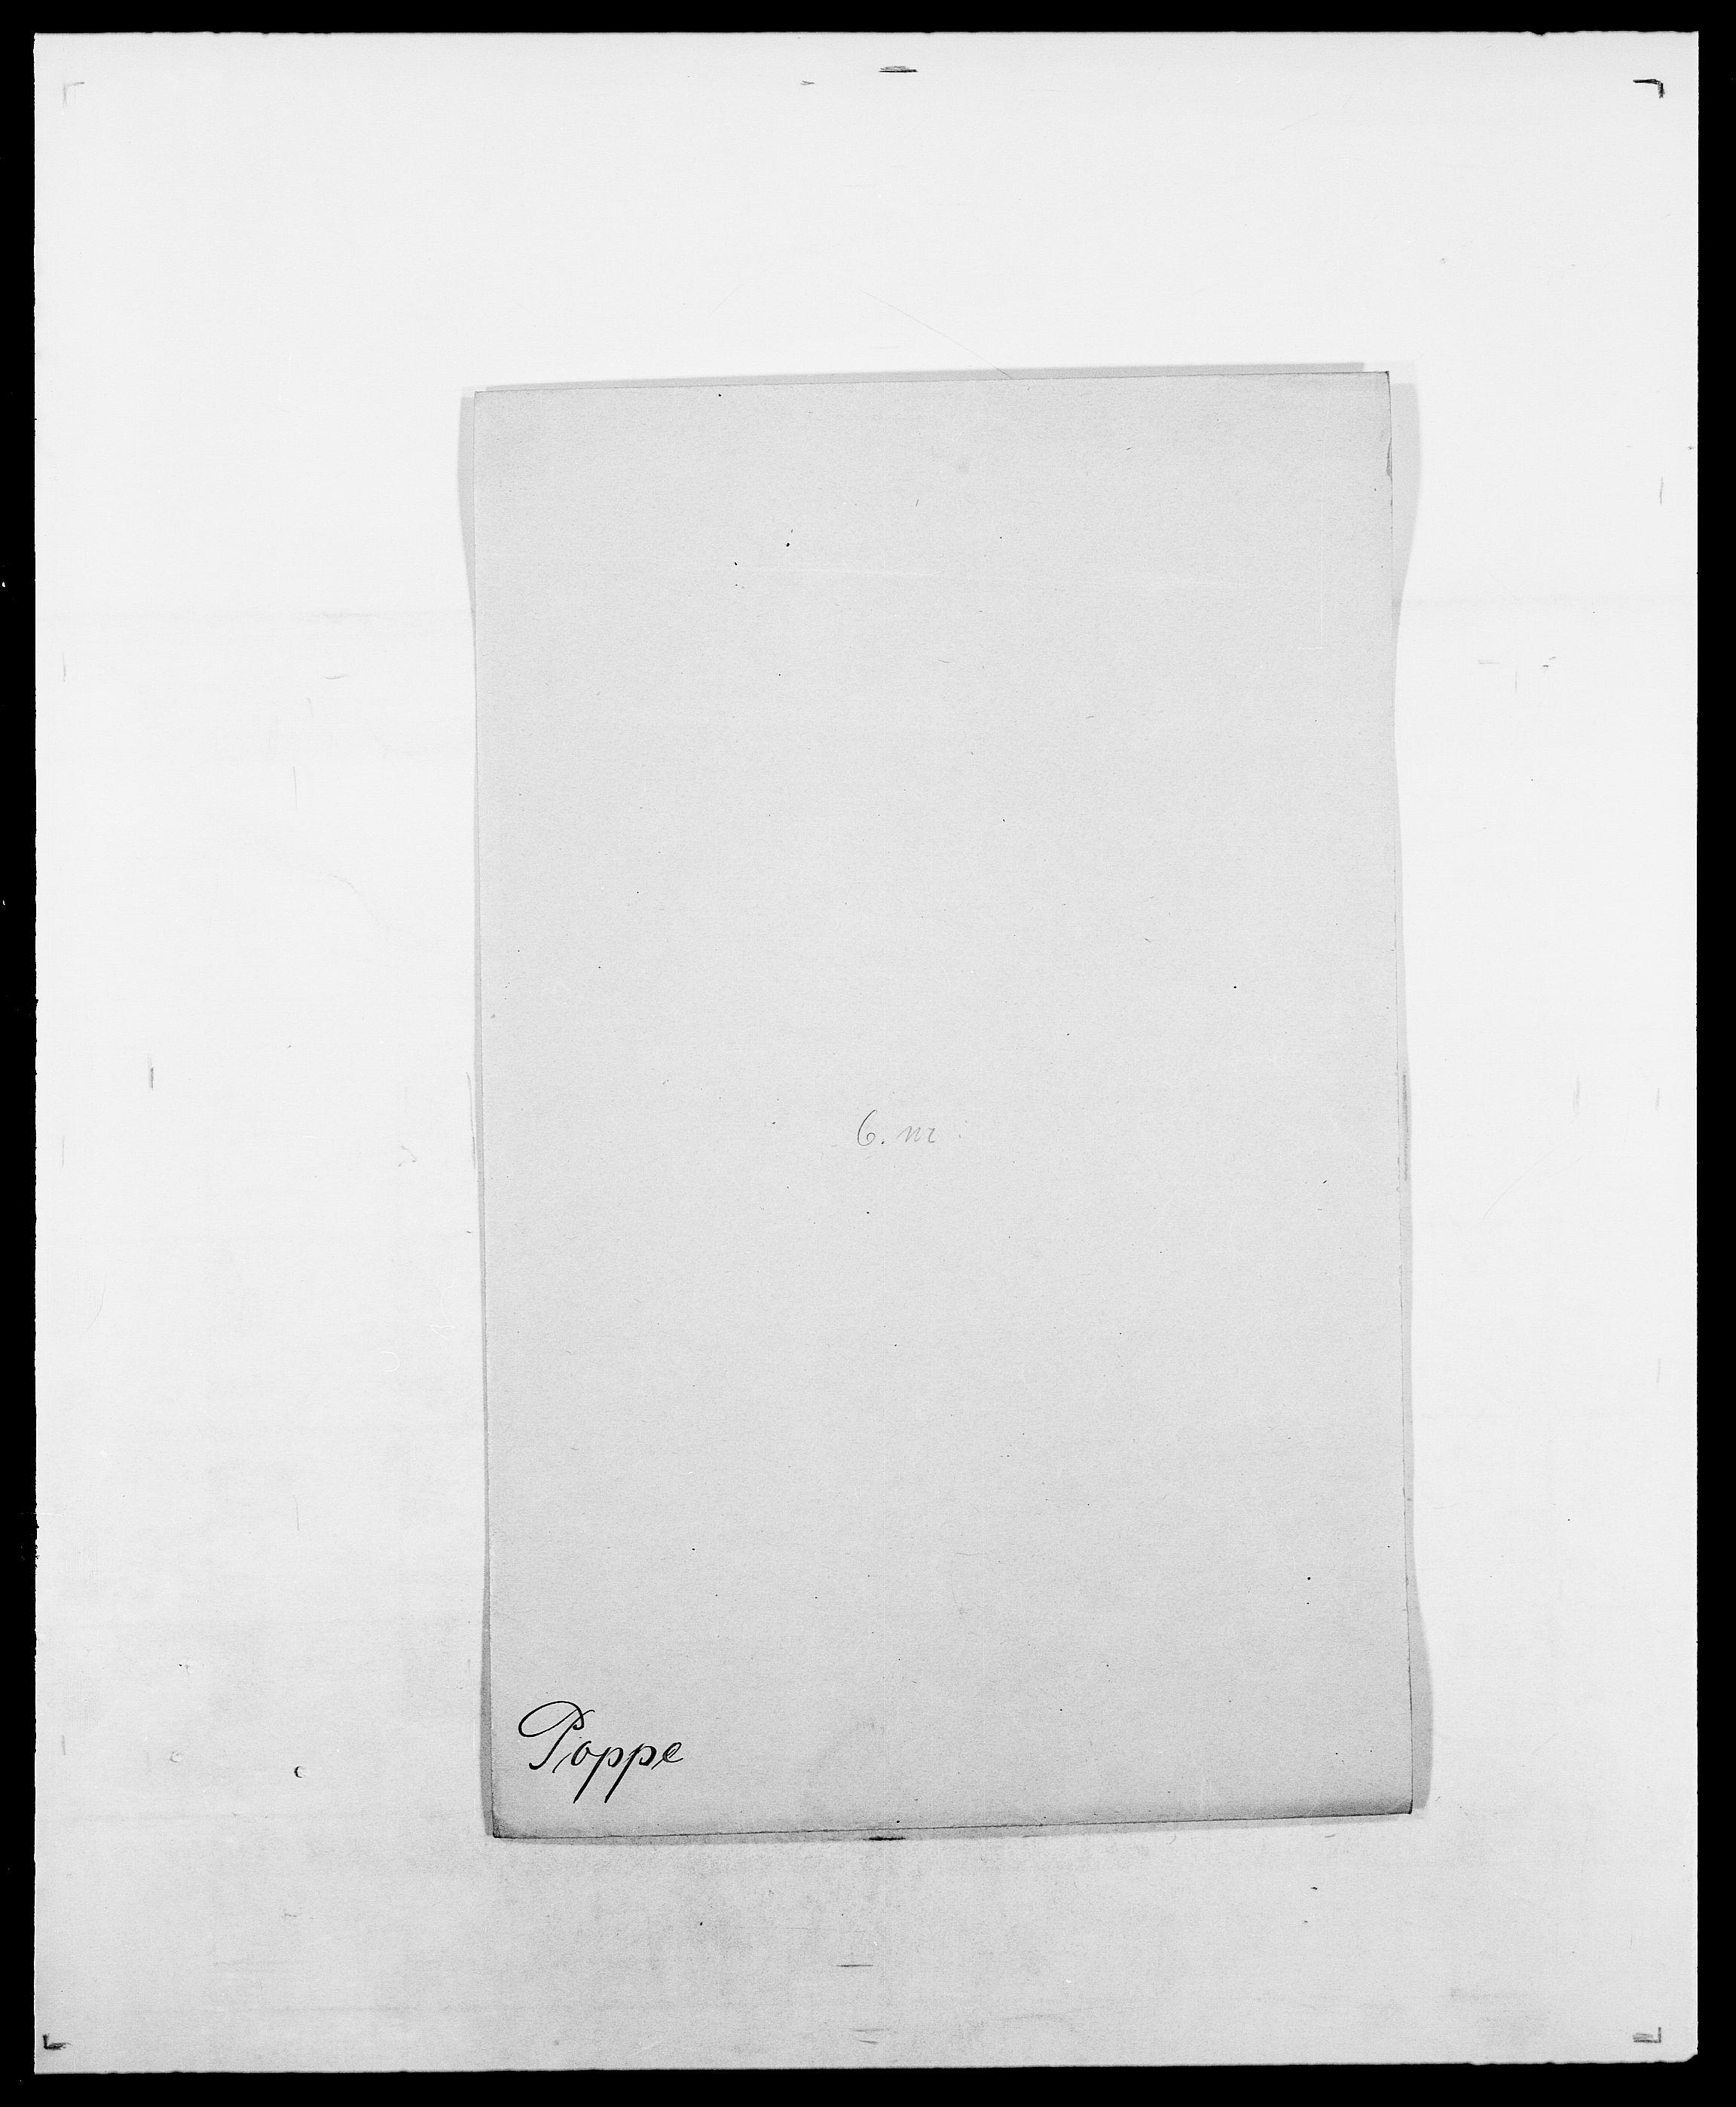 SAO, Delgobe, Charles Antoine - samling, D/Da/L0031: de Place - Raaum, s. 222